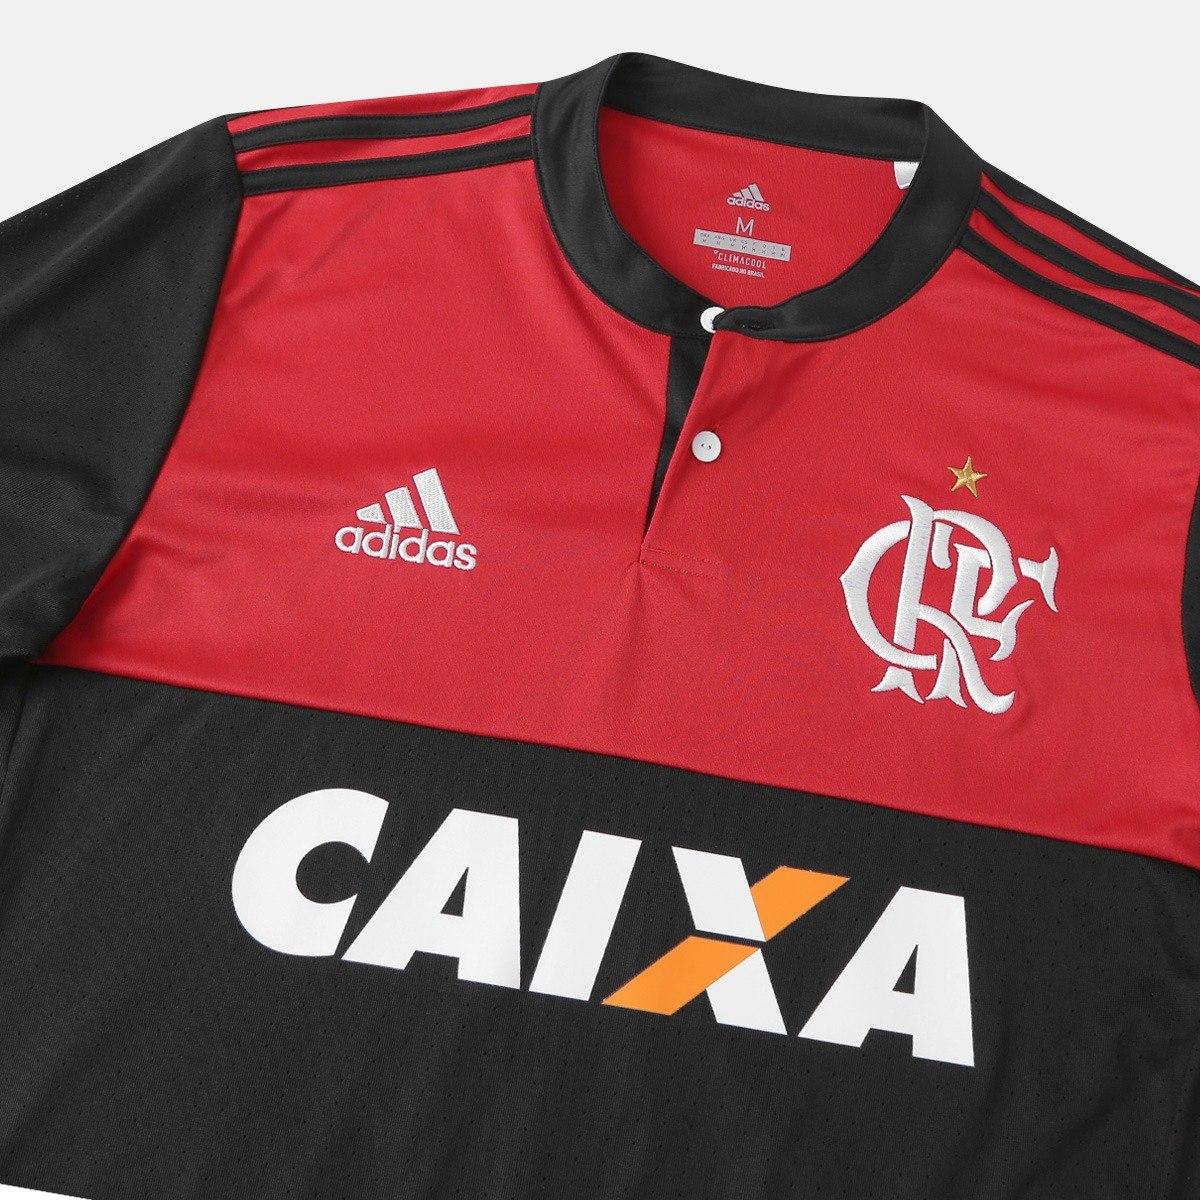 ba6ea302f60 Camisa camiseta Flamengo I 17 18 S n° - Torcedor adidas - R  125